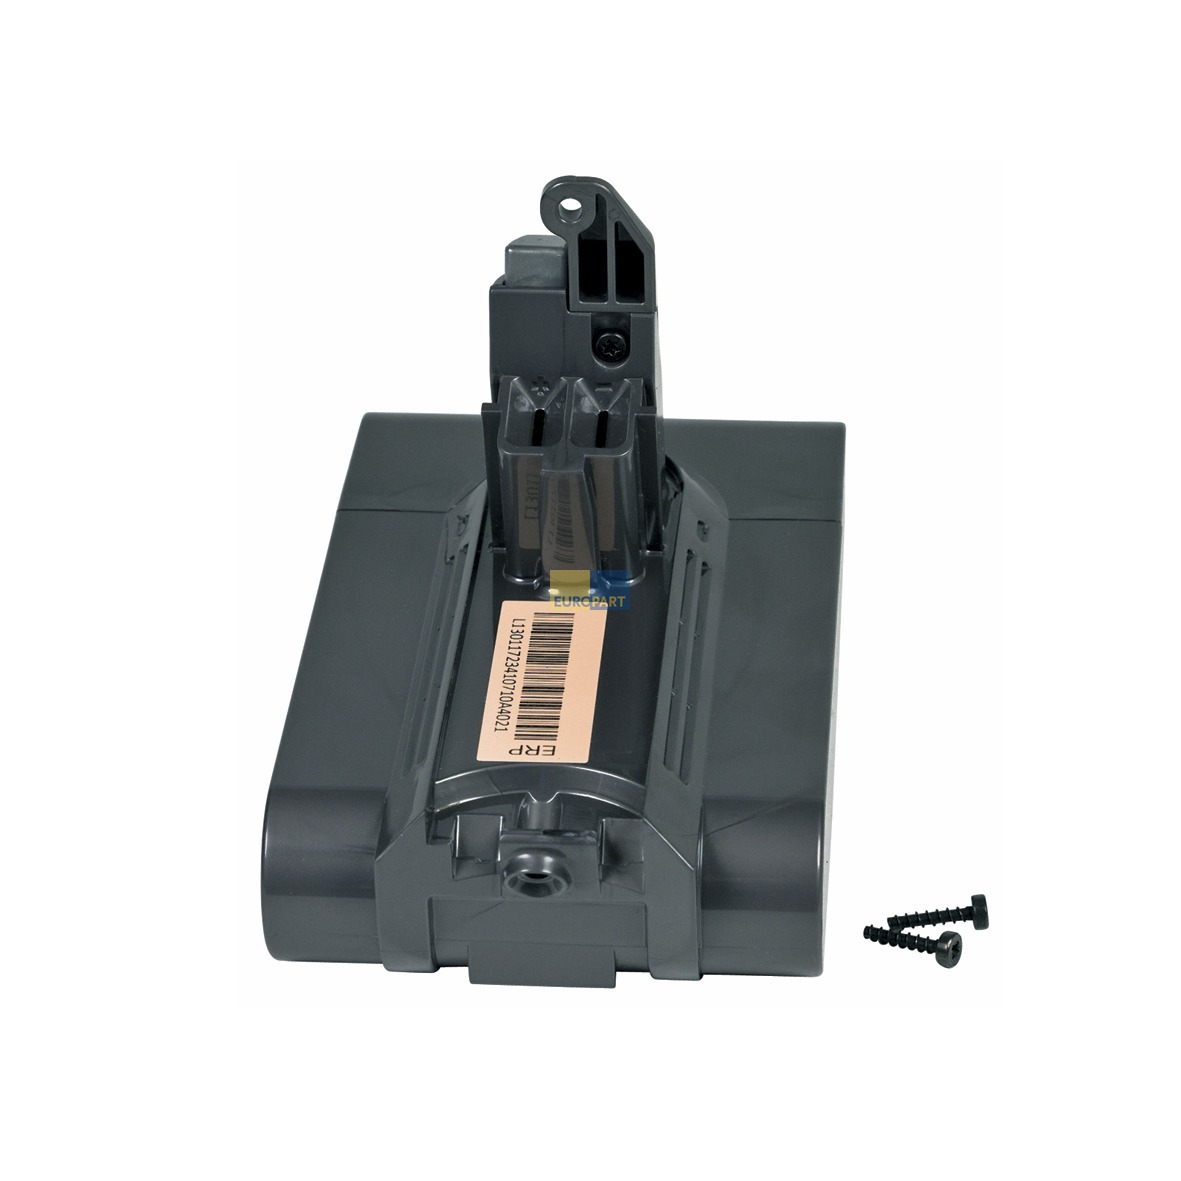 dyson akku batterie dc62 dc 62 f r handstaubsauger nr 965874 01 ersatz f r 96587 ebay. Black Bedroom Furniture Sets. Home Design Ideas